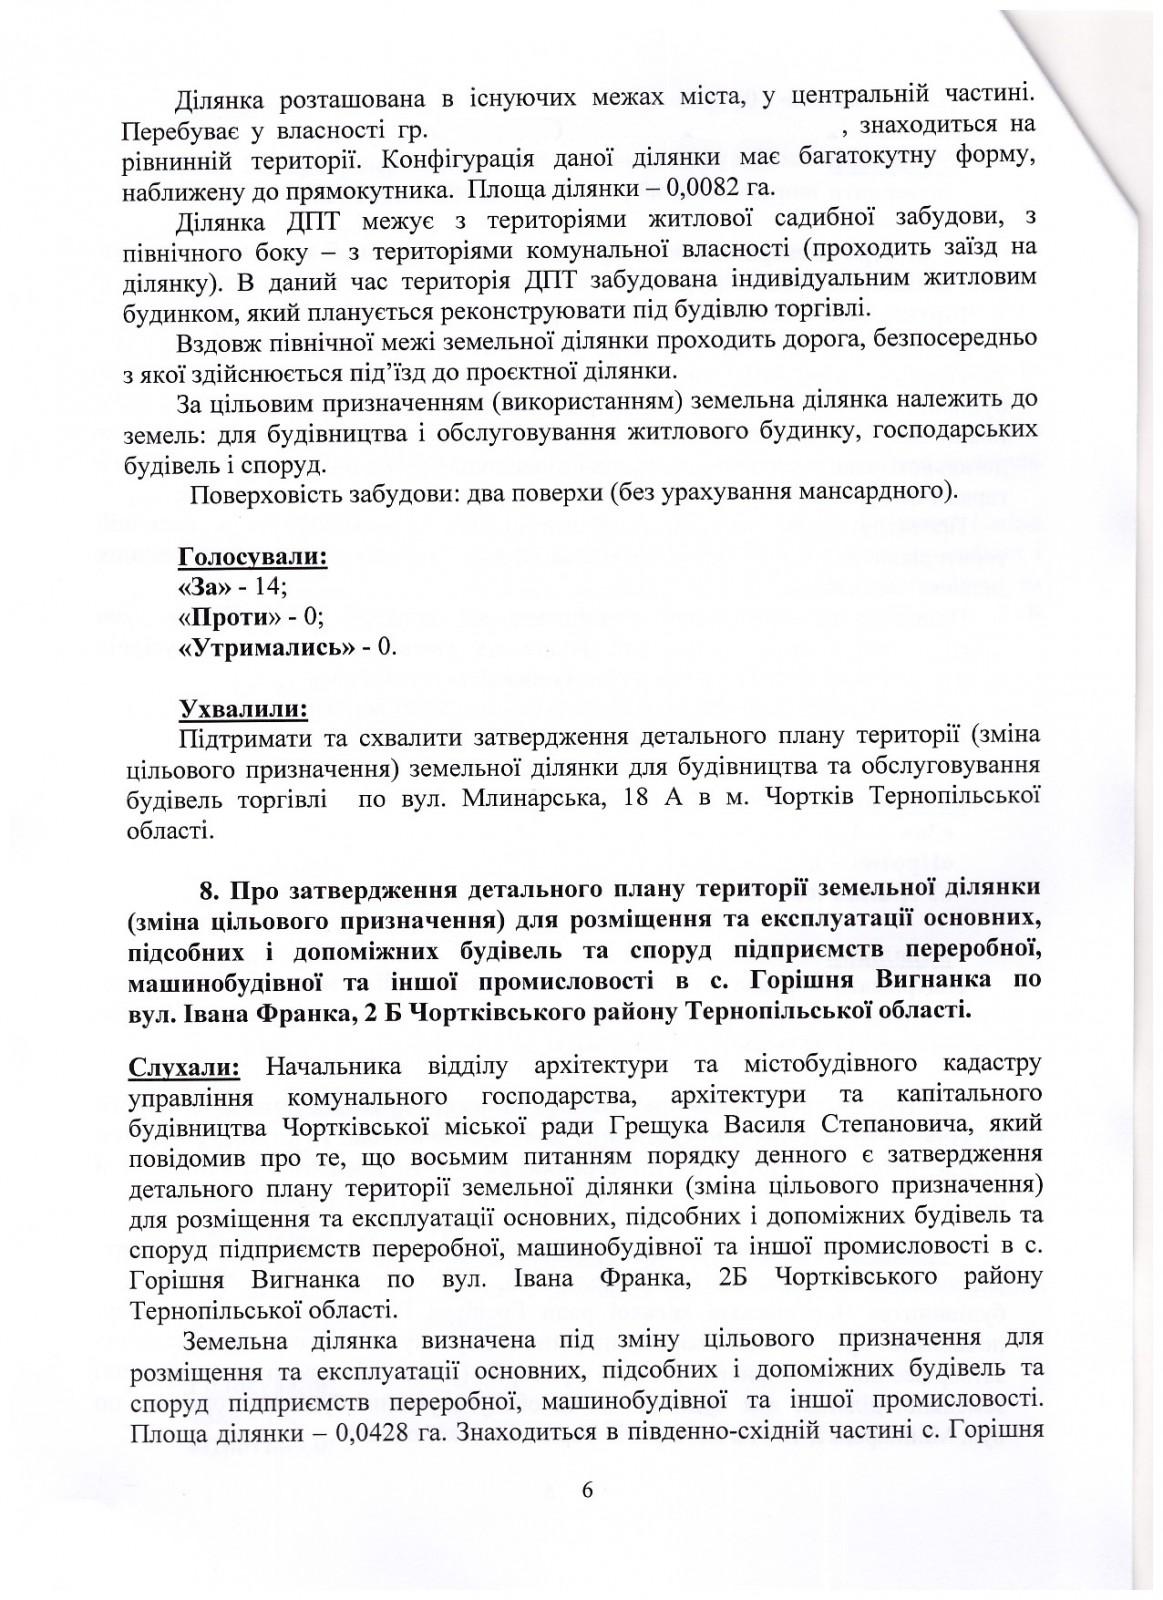 протокол громадських слухань_03-09-2021 (-6